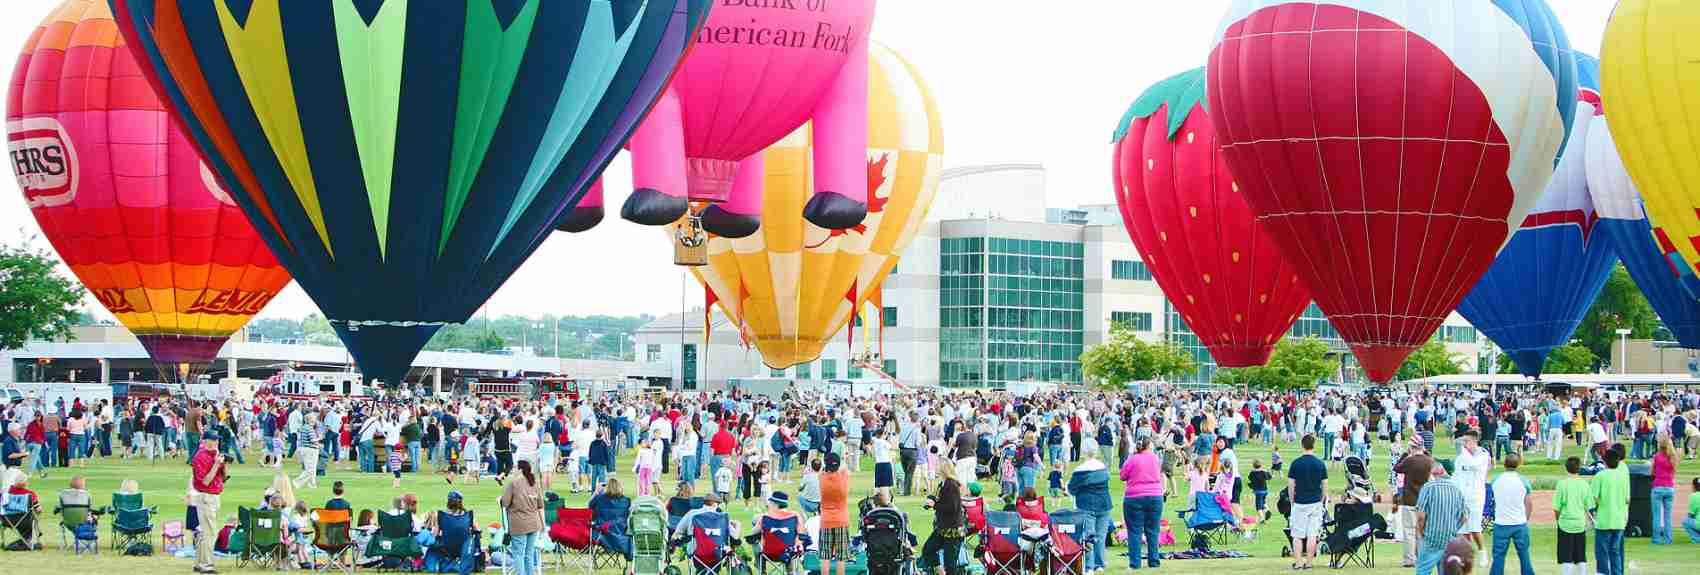 Utah Valley Hot Air balloons